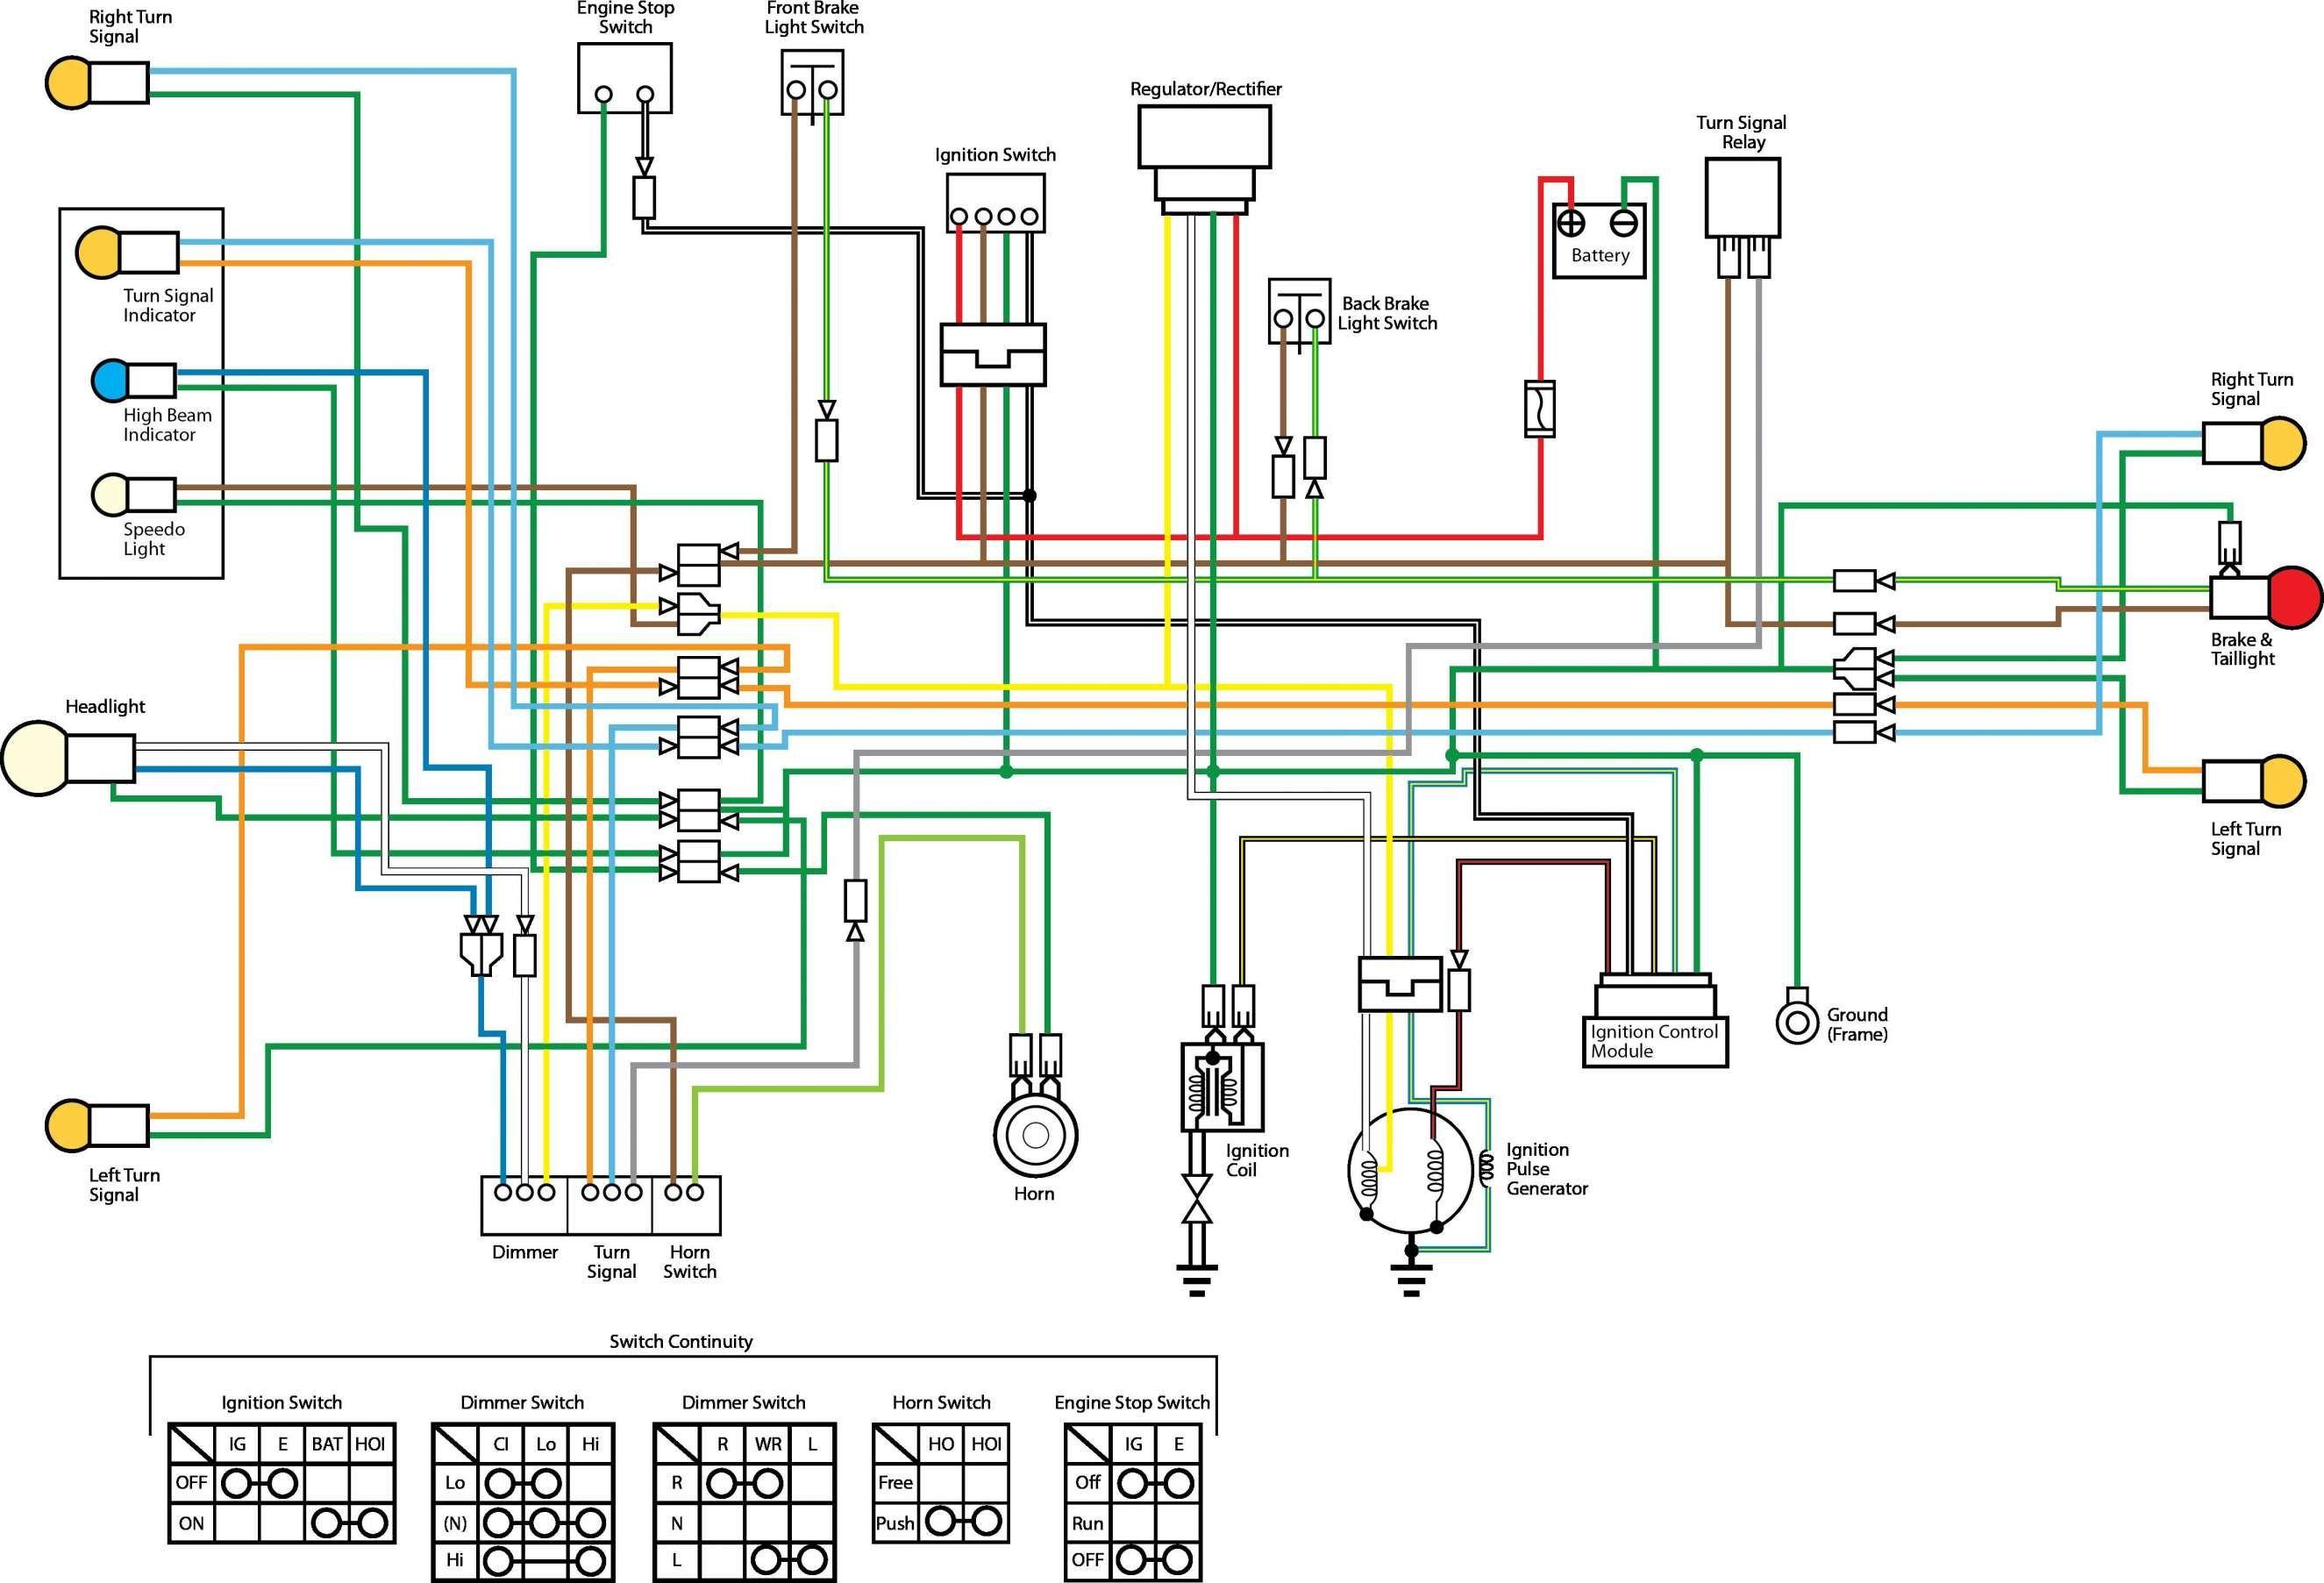 17 Honda Wave Motorcycle Parts Diagram Motorcycle Wiring Electrical Wiring Diagram Electrical Diagram